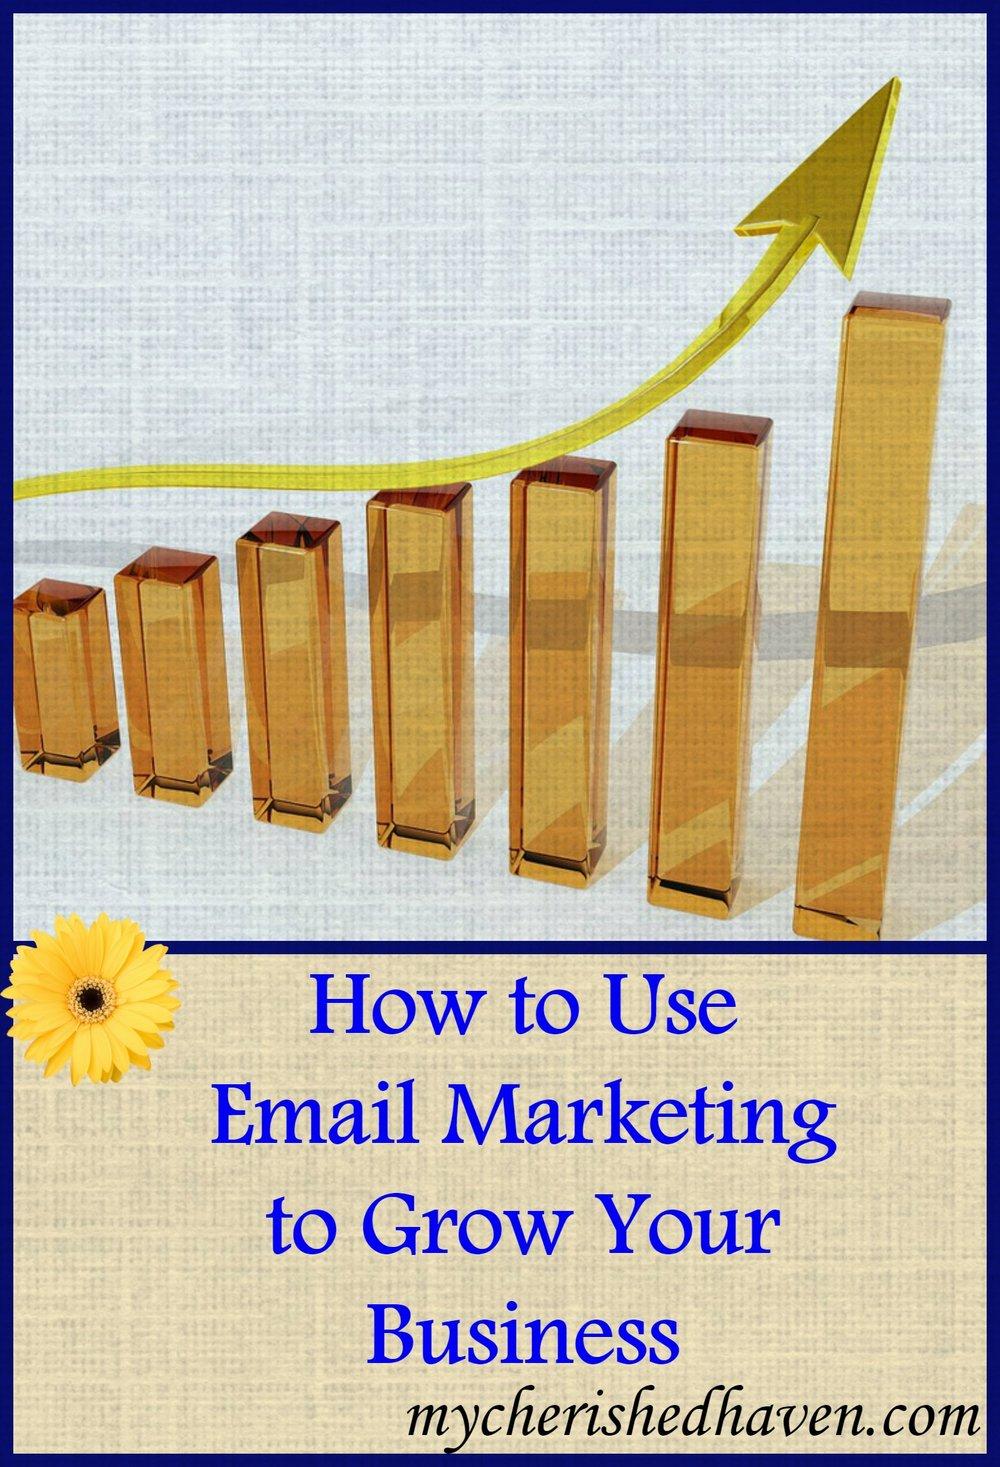 emailmarketingtogrowyourbusiness